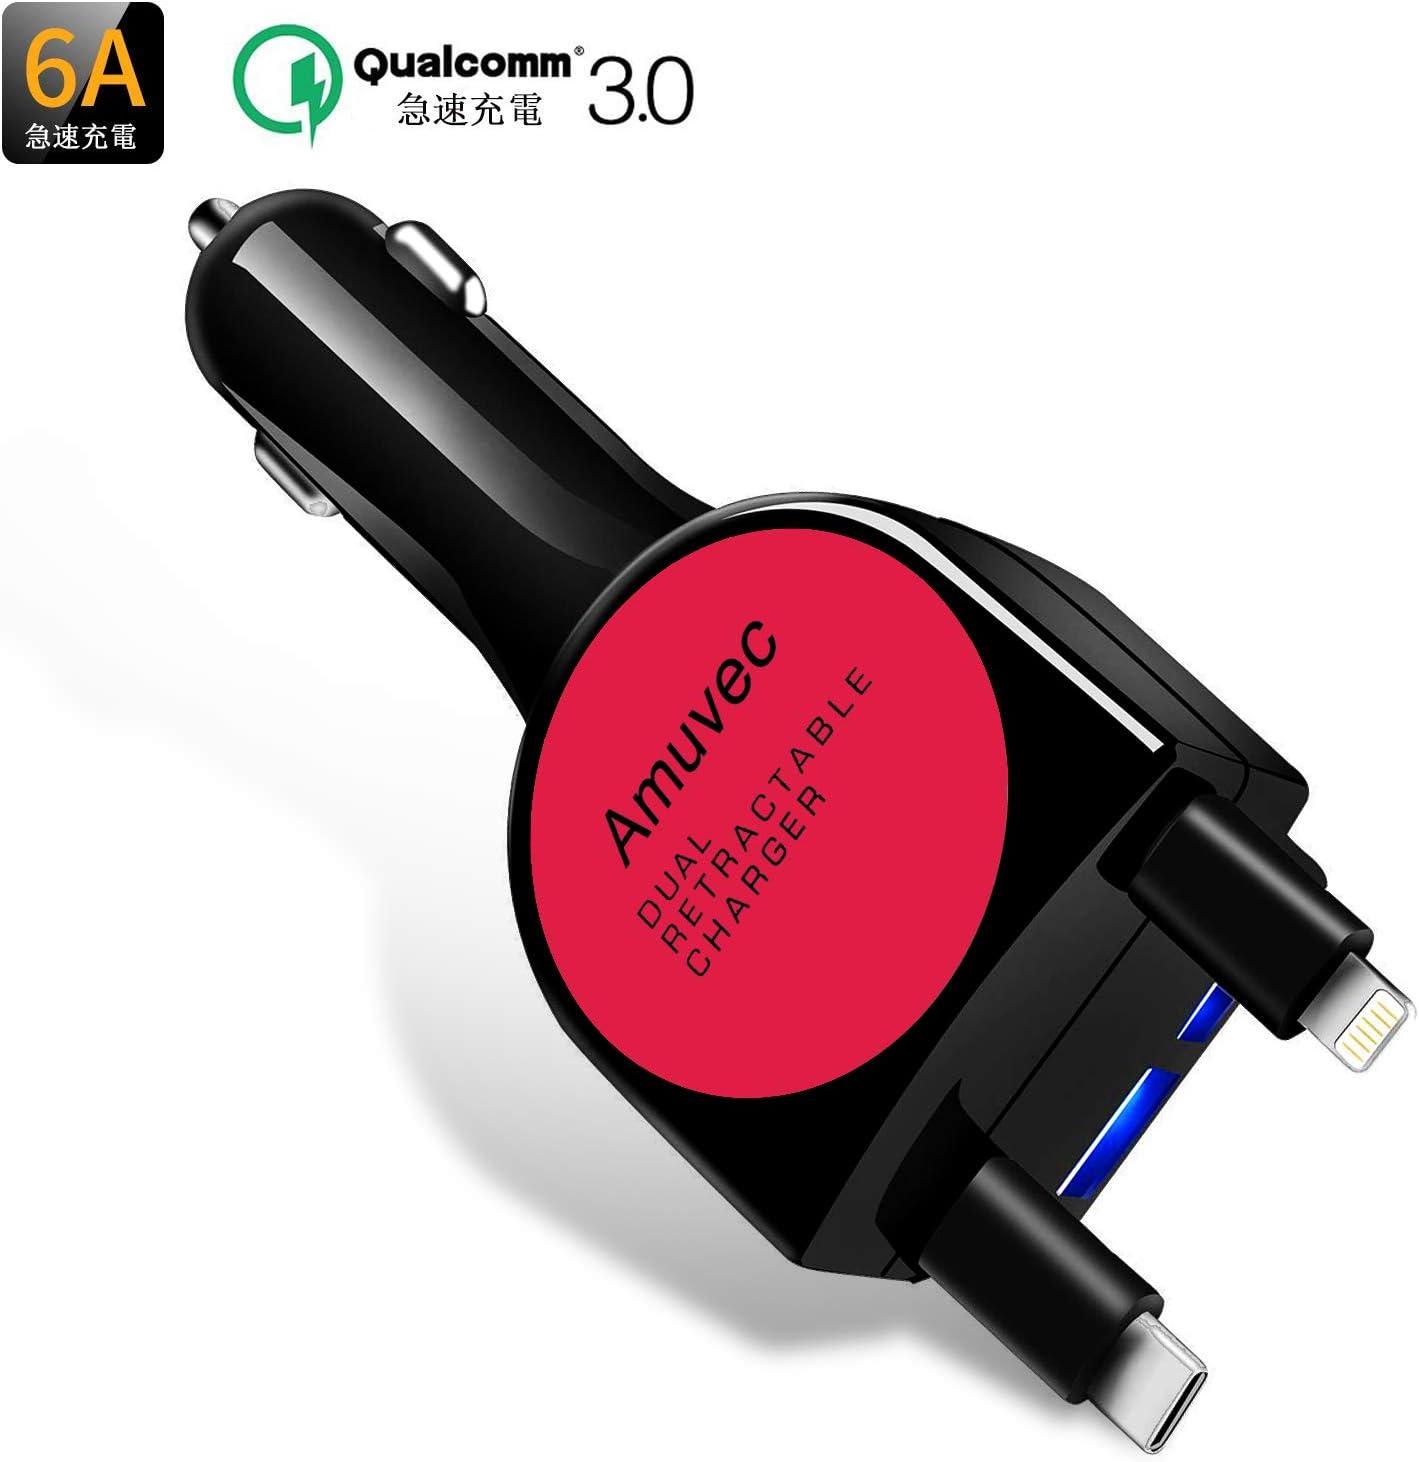 【Quick Charge 3.0】Amuvec 車載充電器 USB2ポートカーチャージャー シガーソケットチャージャ しがらいたーソケット usb 急速充電(6A/40W) LightningとタイプCデュアル80cm 巻取り式ケーブル ために iPhone XS/ Max/ XR/ X/ 8 /7/ 6/ Plus /Galaxy S9/ S8/ Note 8 LG V30 Google Pixel 2 XL/SamSung 対応 (赤) …